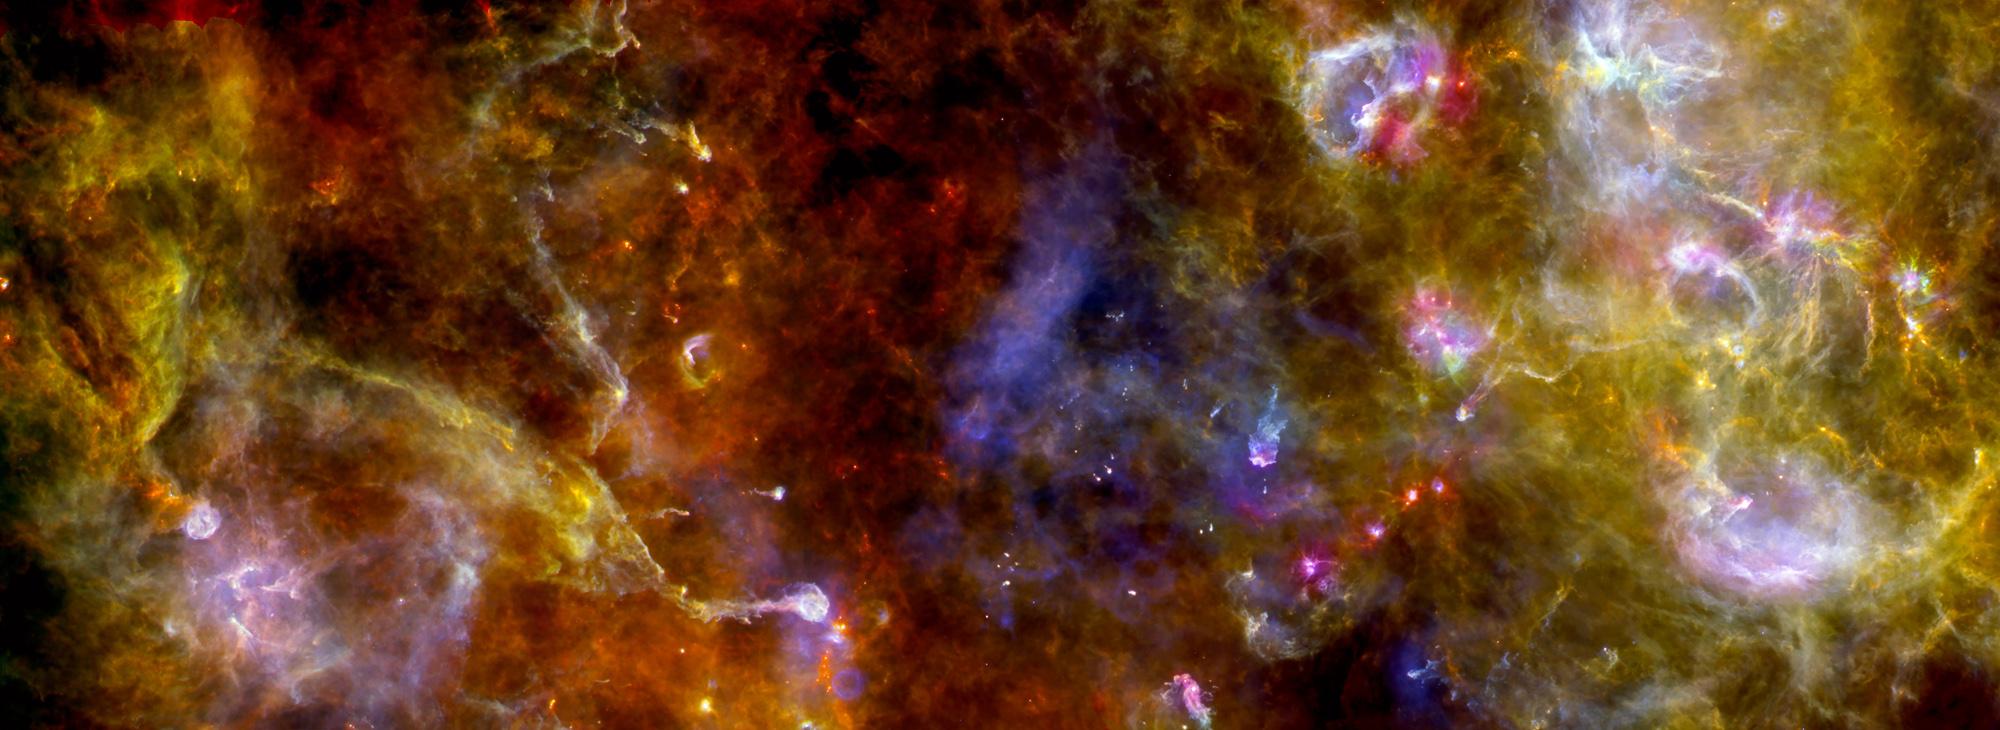 Star Factory Blazes Bright in Stunning New Photo